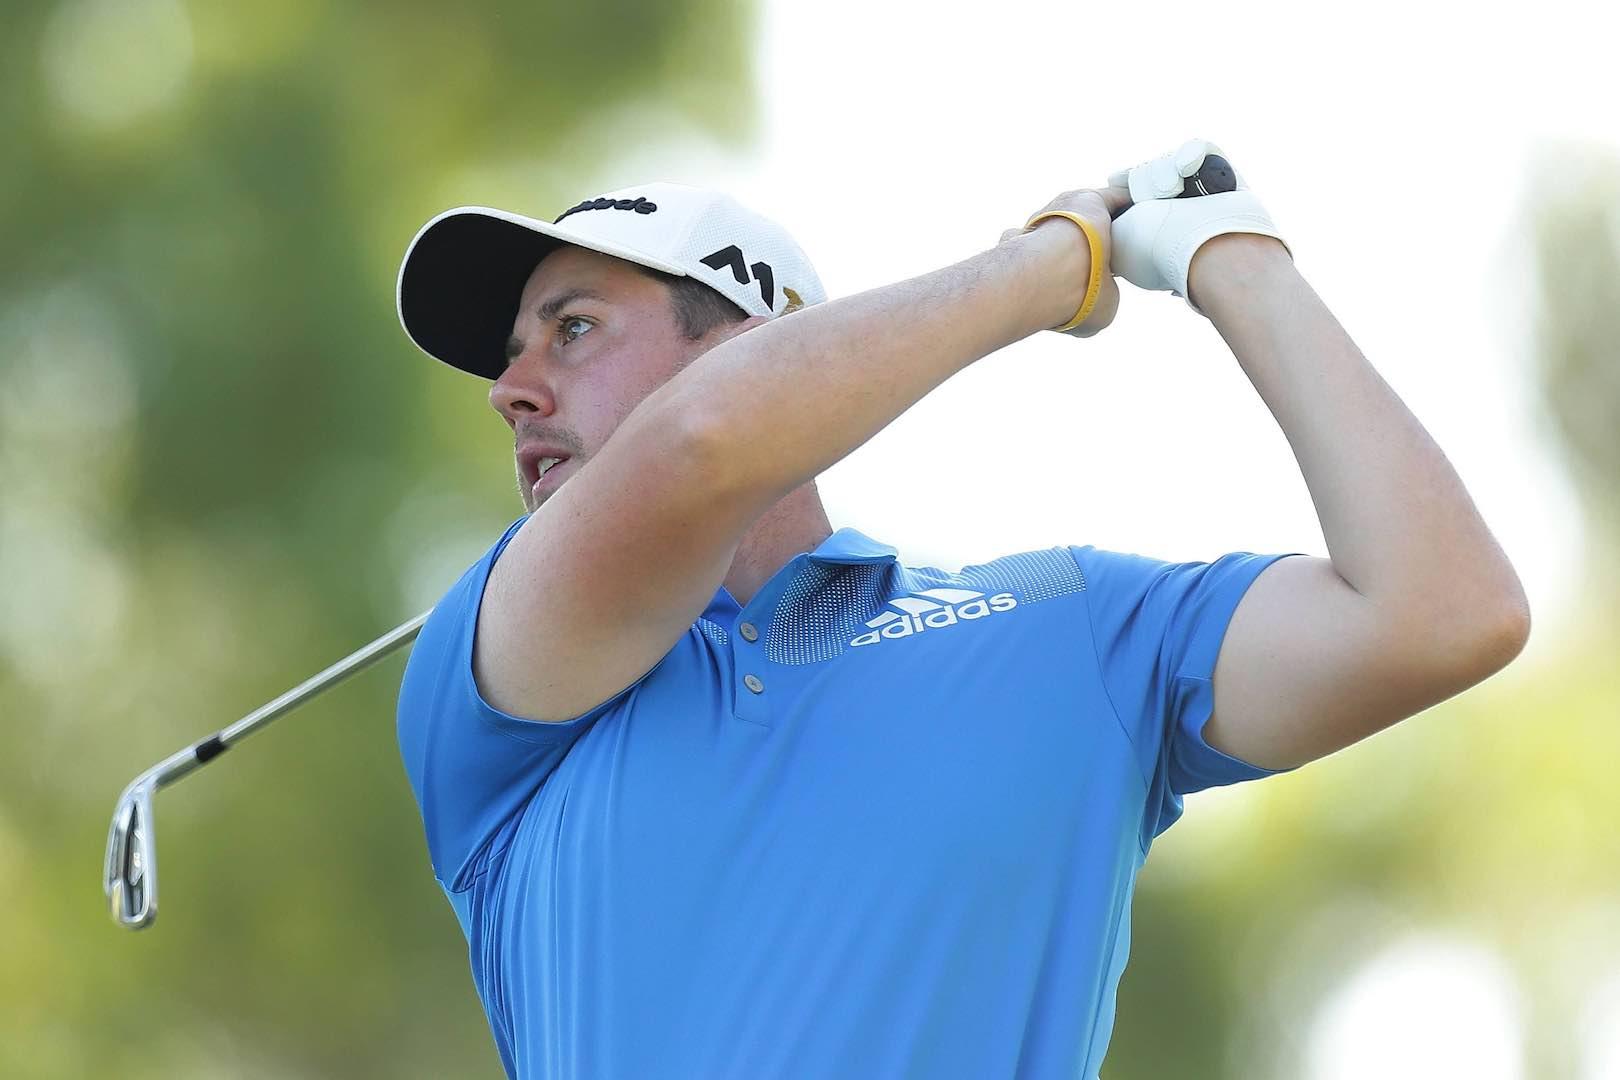 Golf Spiv calls the Czech Masters